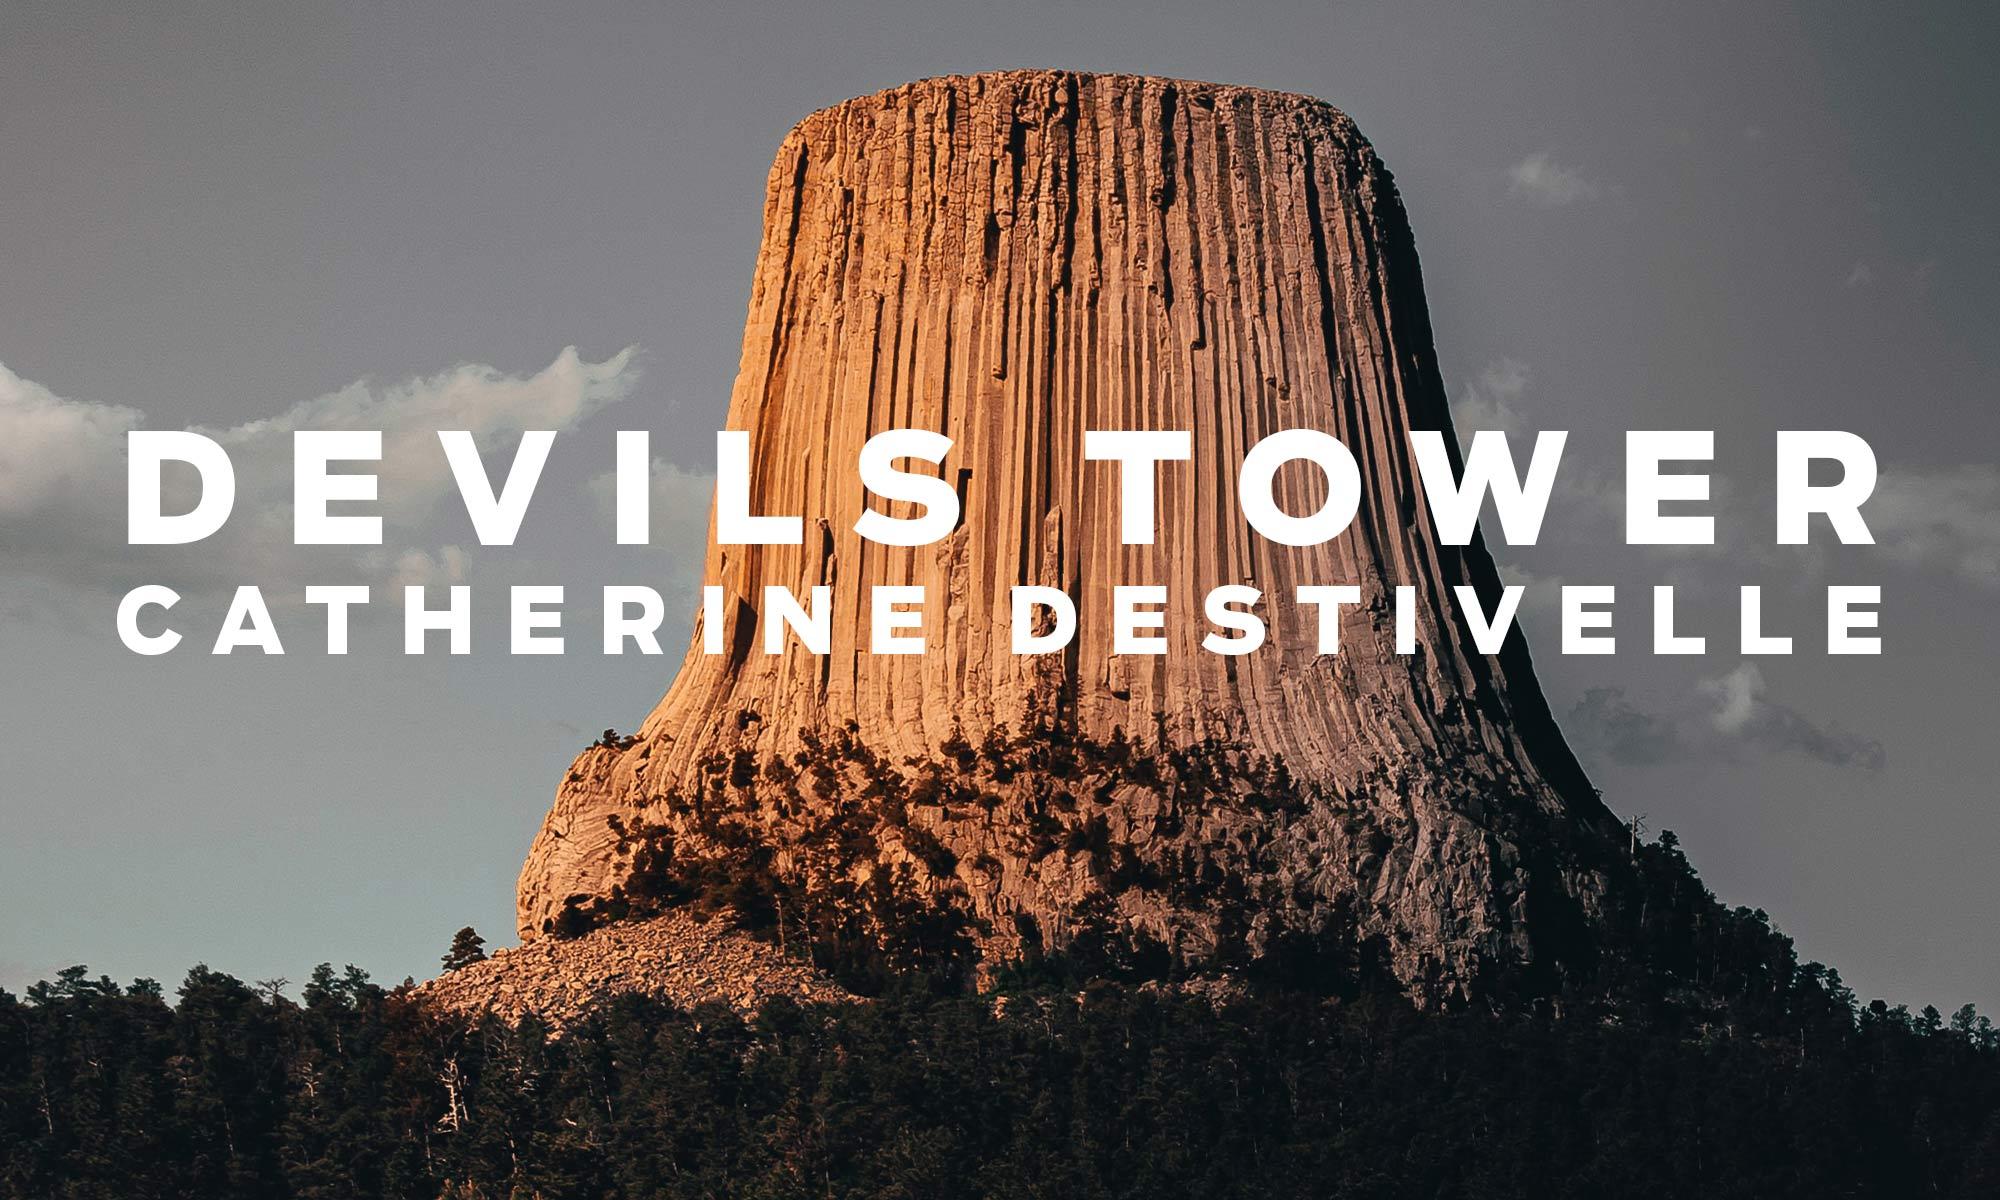 Devils Tower - Catherine Destivelle